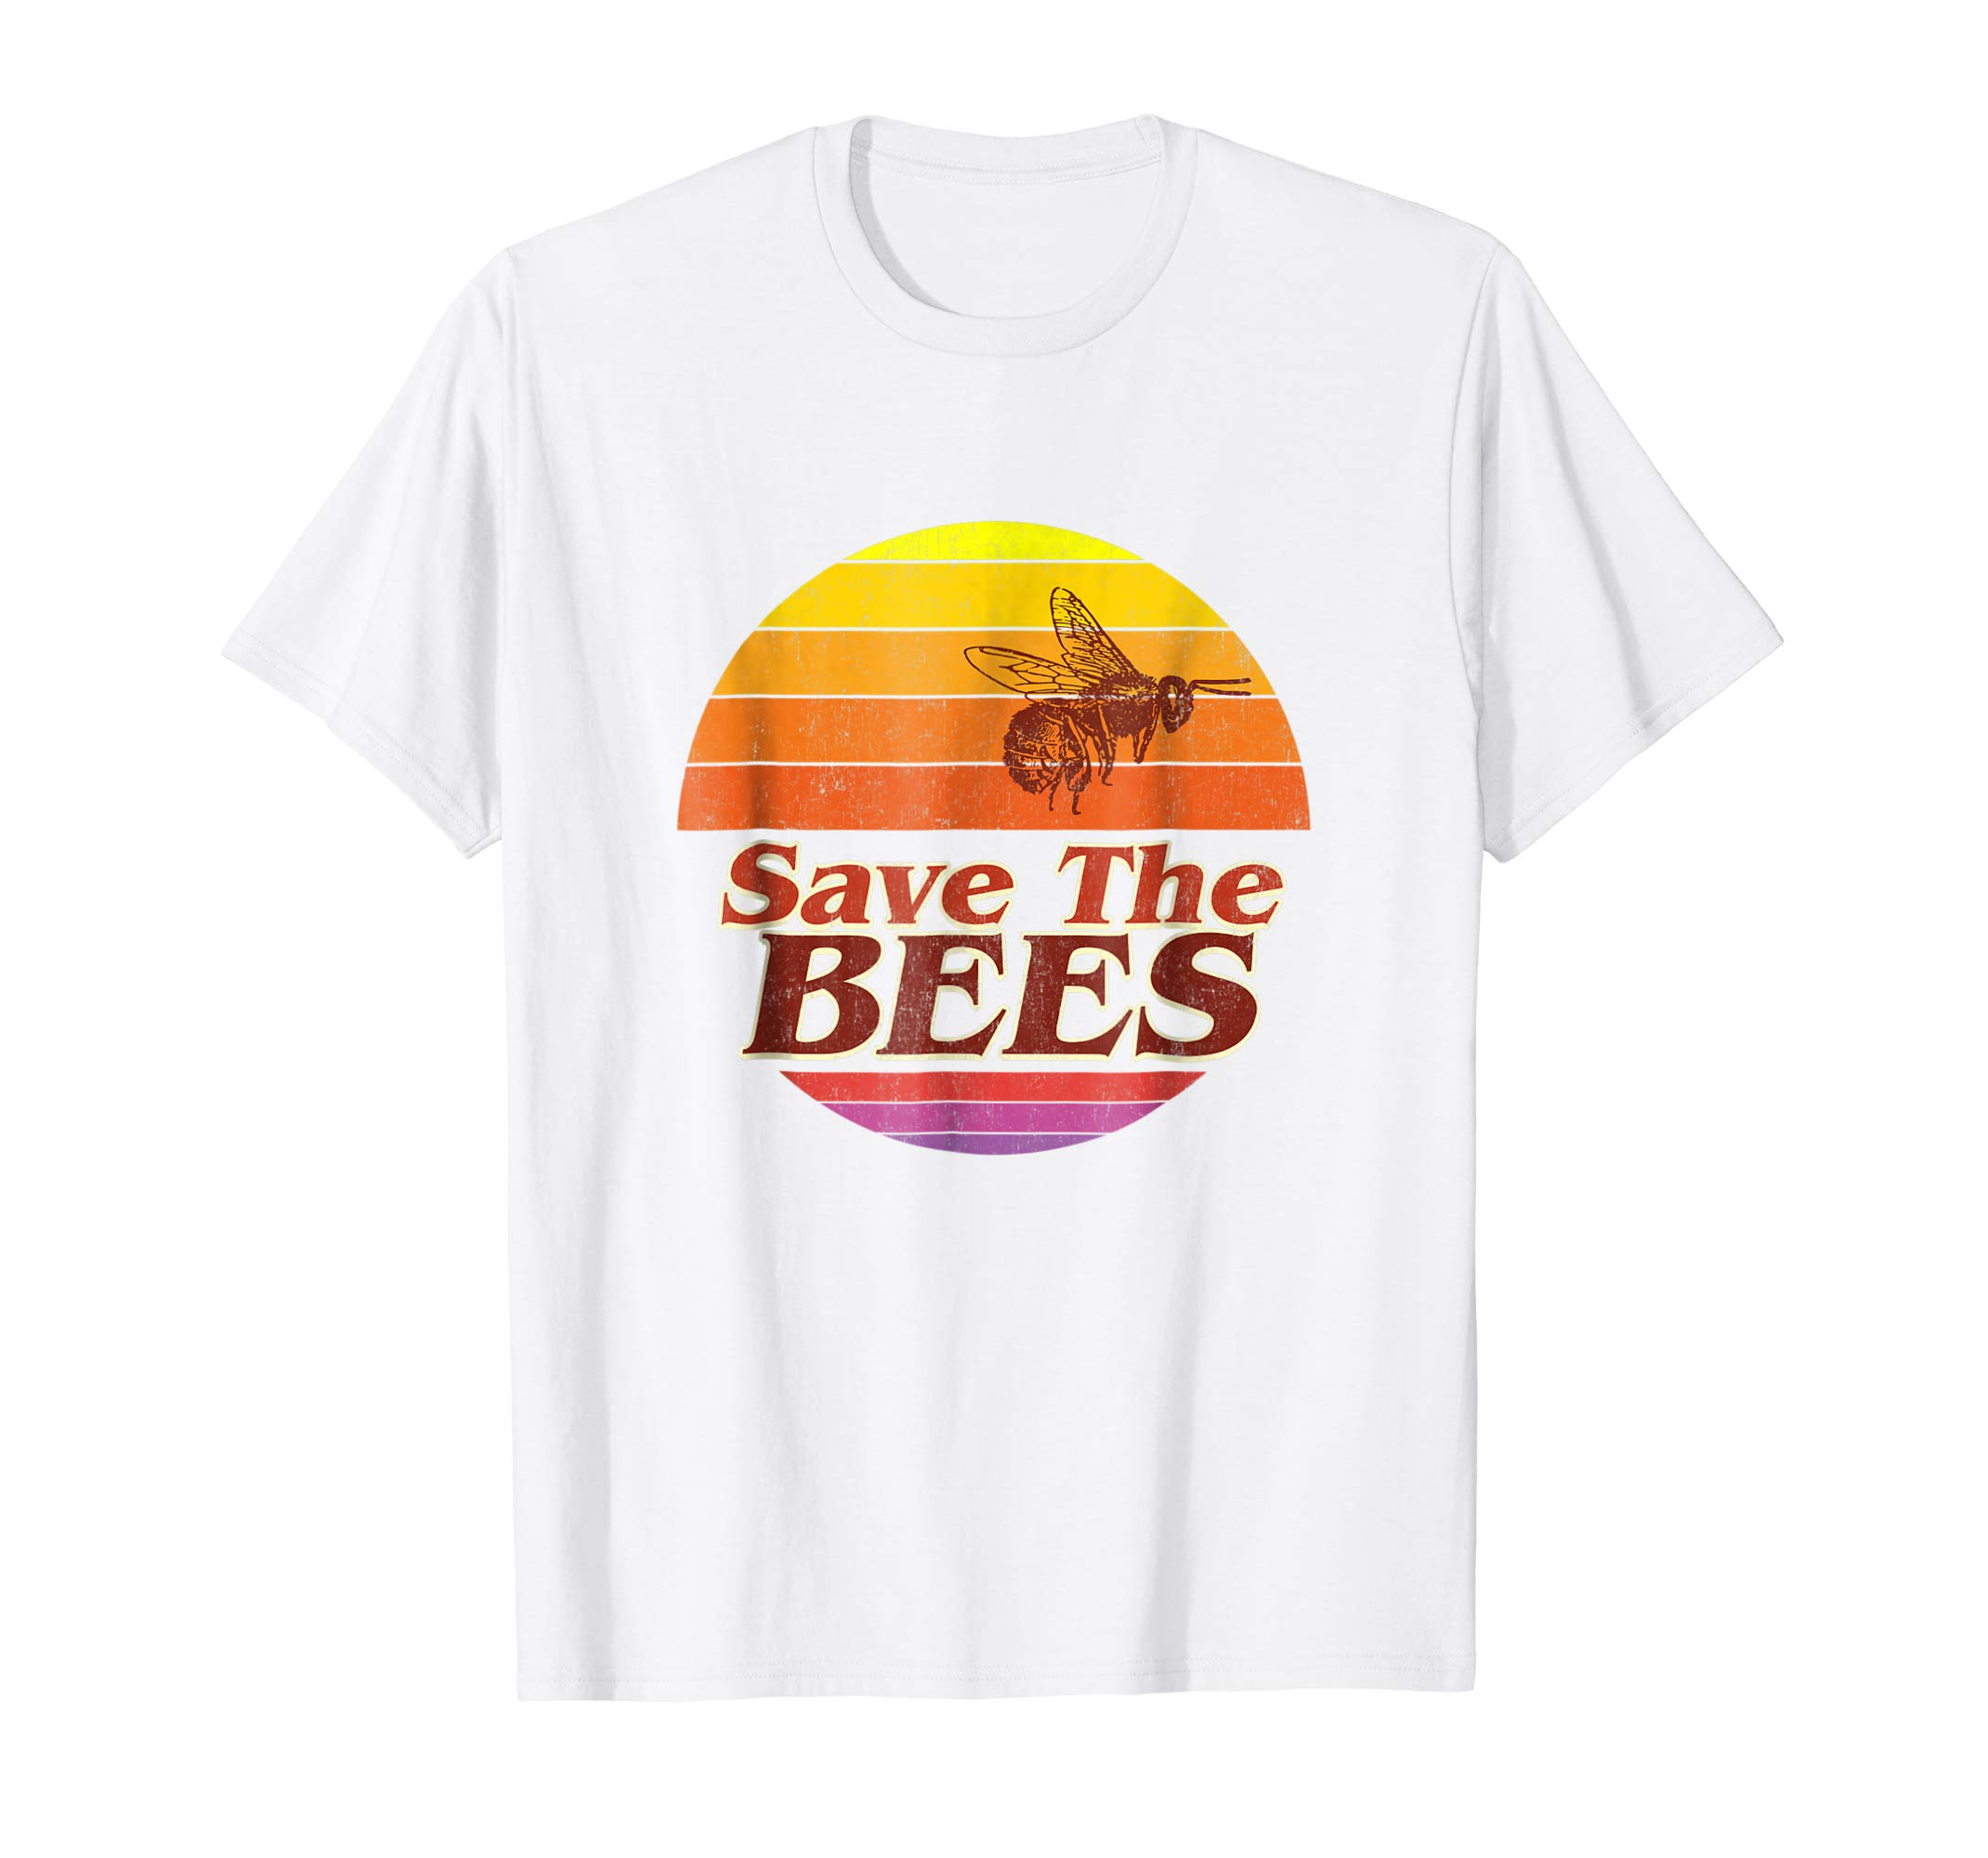 Save The Bees T-shirt Flower Men Women Vintage Retro Fashion-AZP